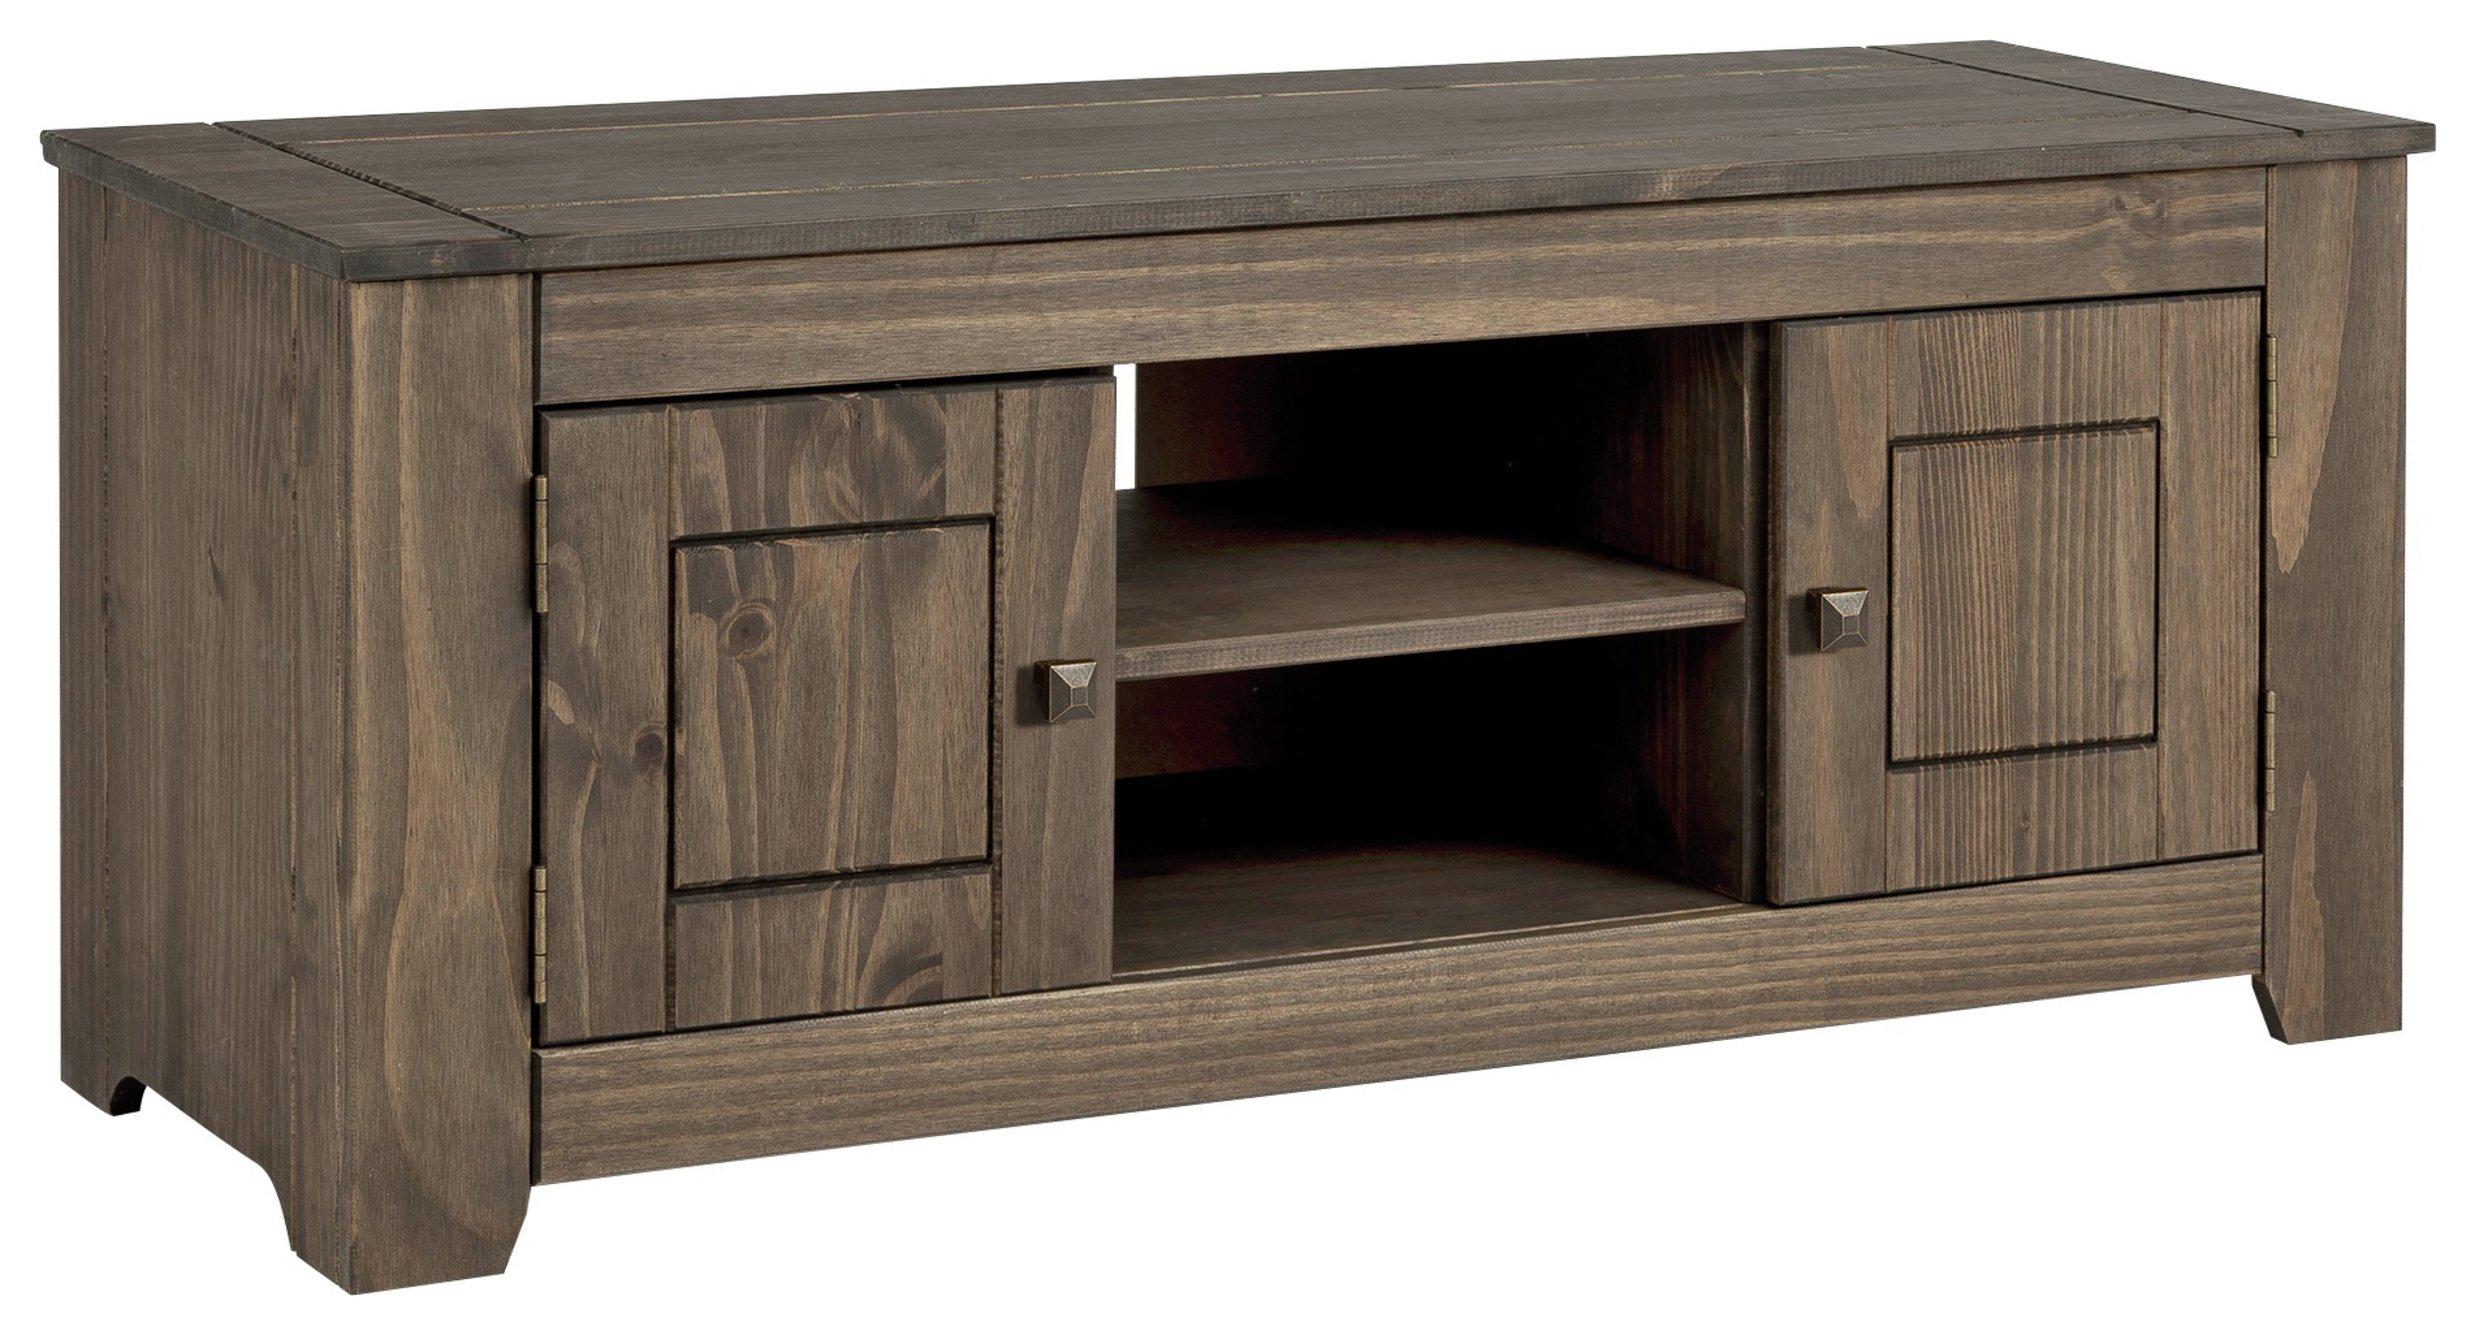 Argos Home Amersham Large Solid Wood TV Unit - Dark Pine